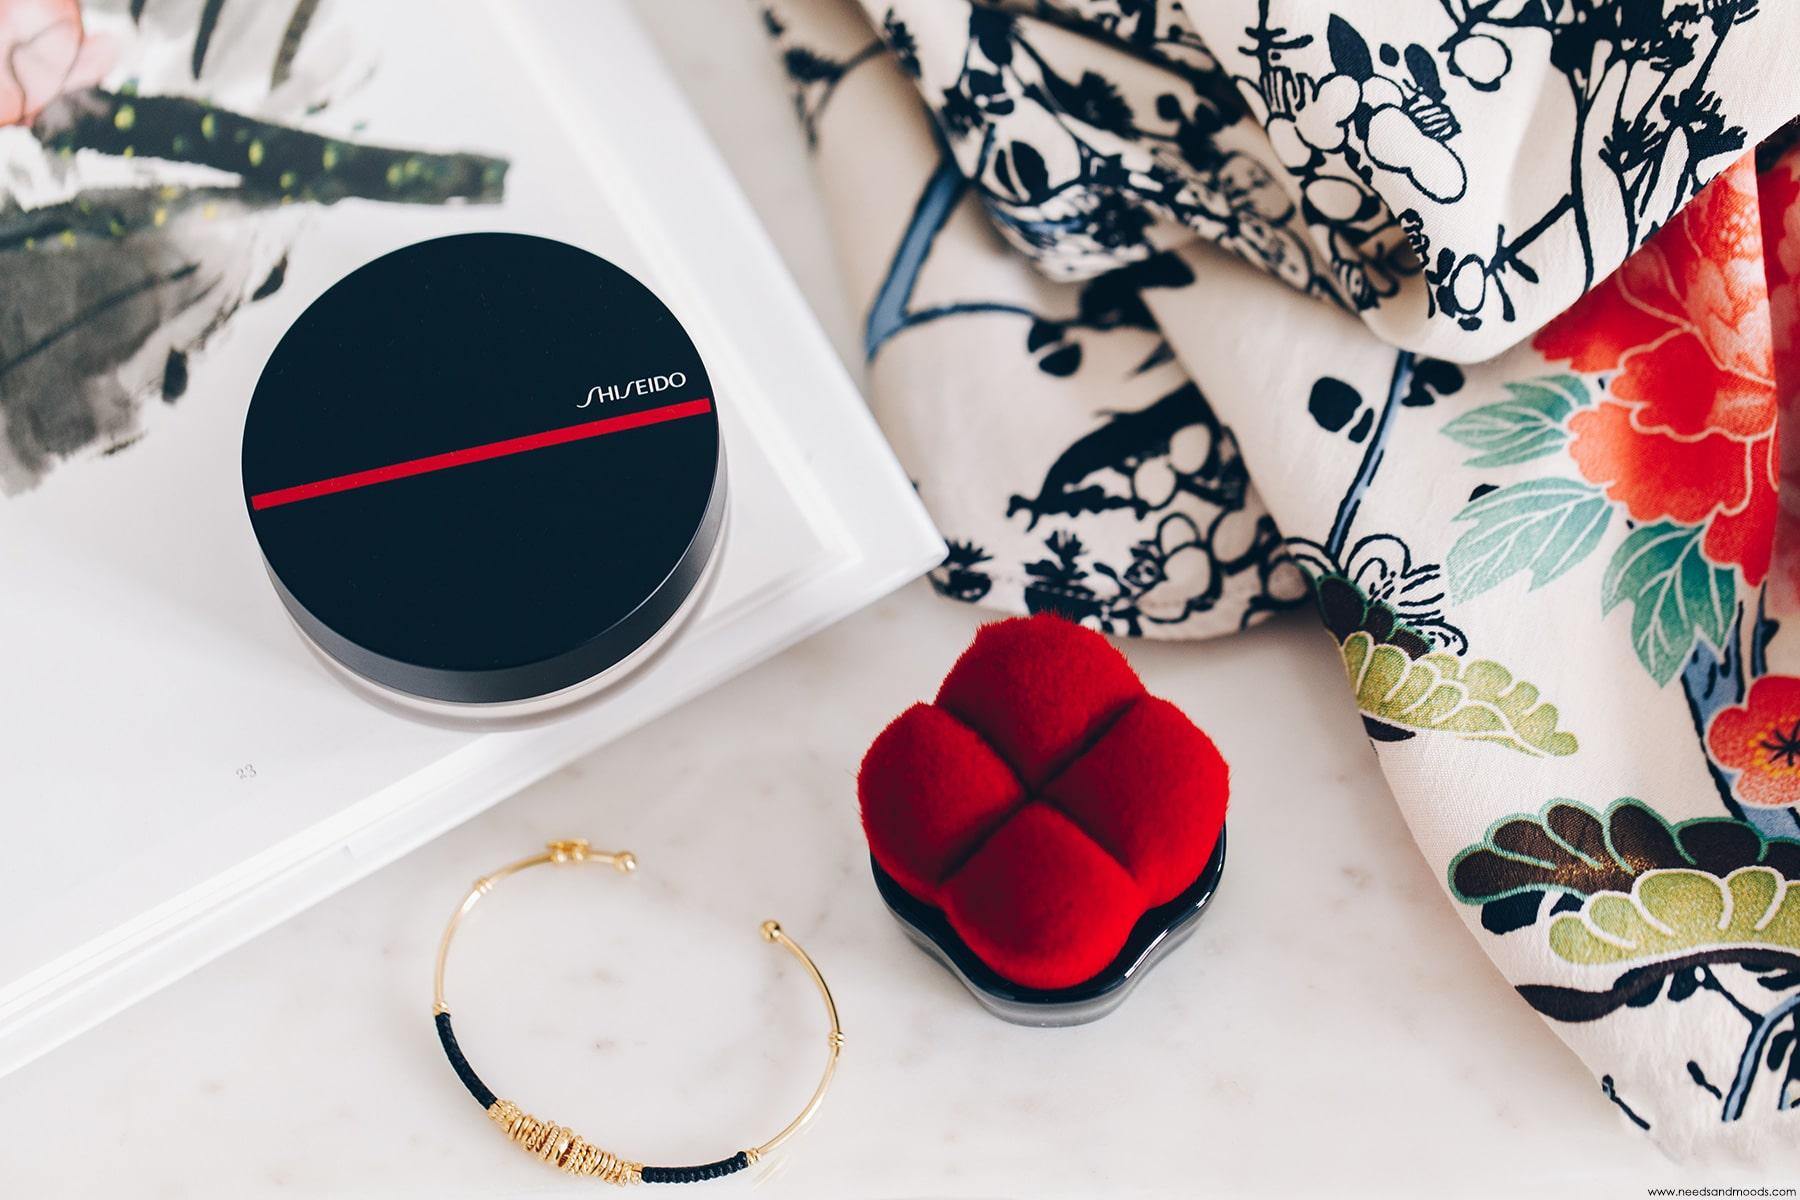 shiseido poudre libre visage